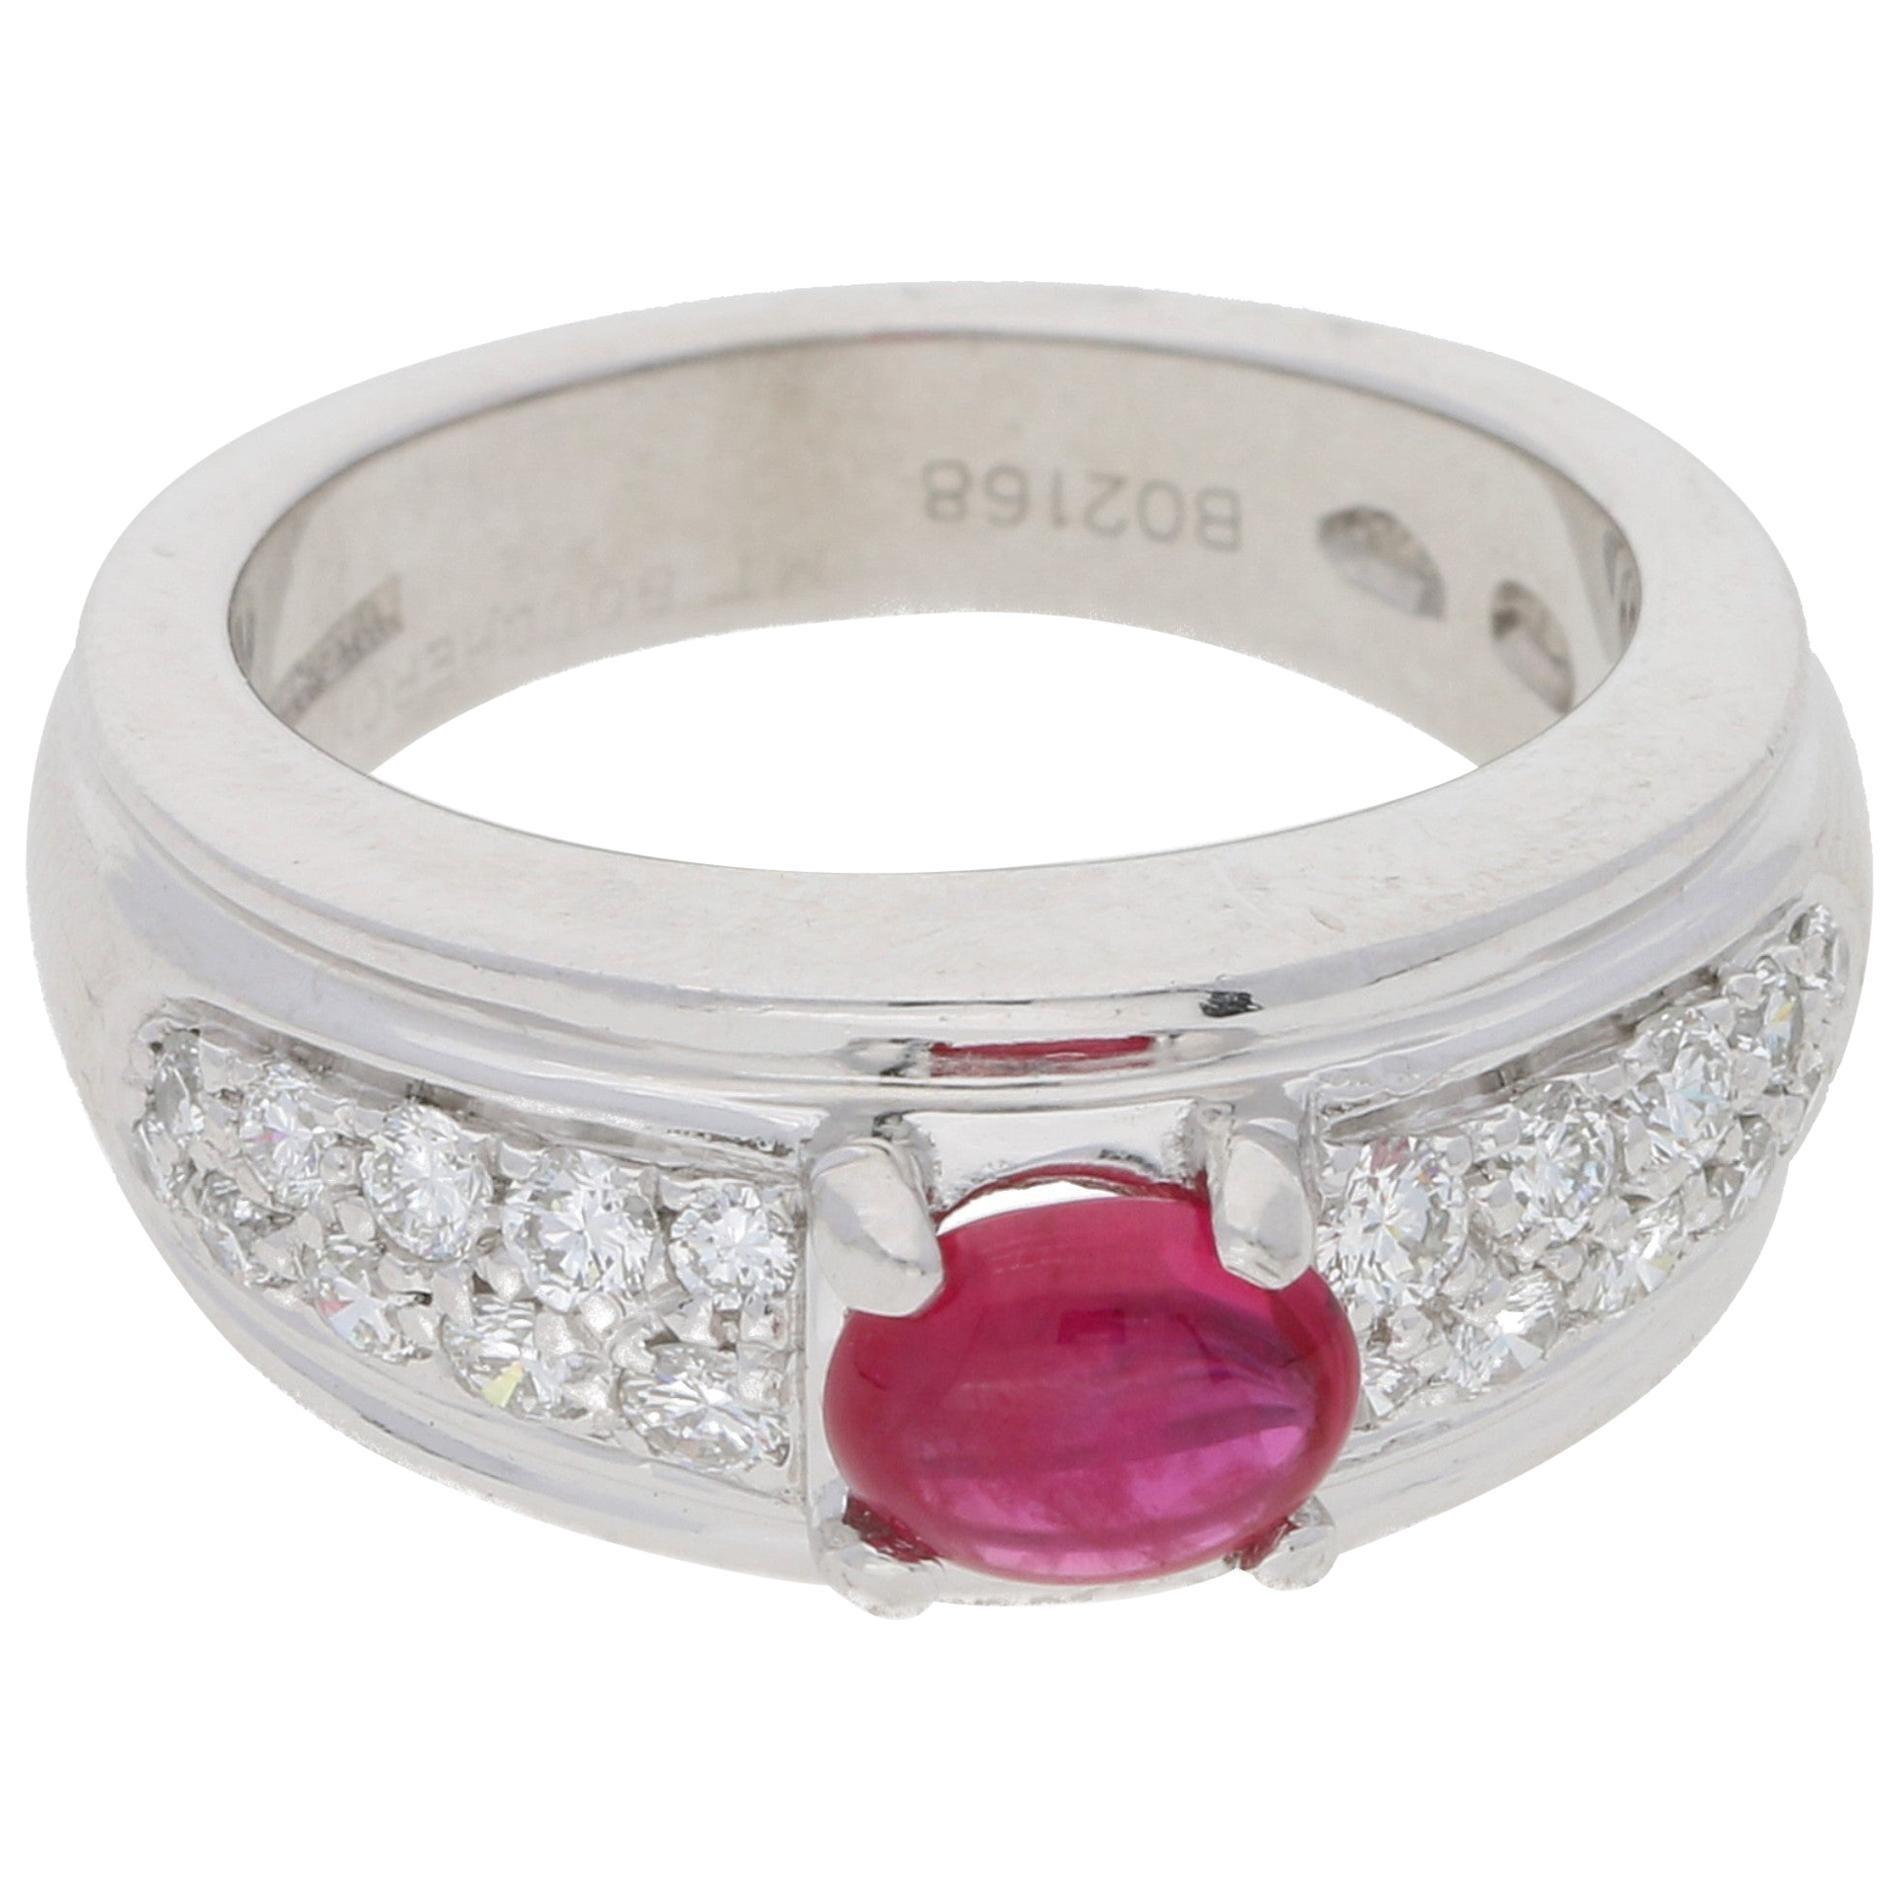 Boucheron Ruby and Diamond Platinum Ring